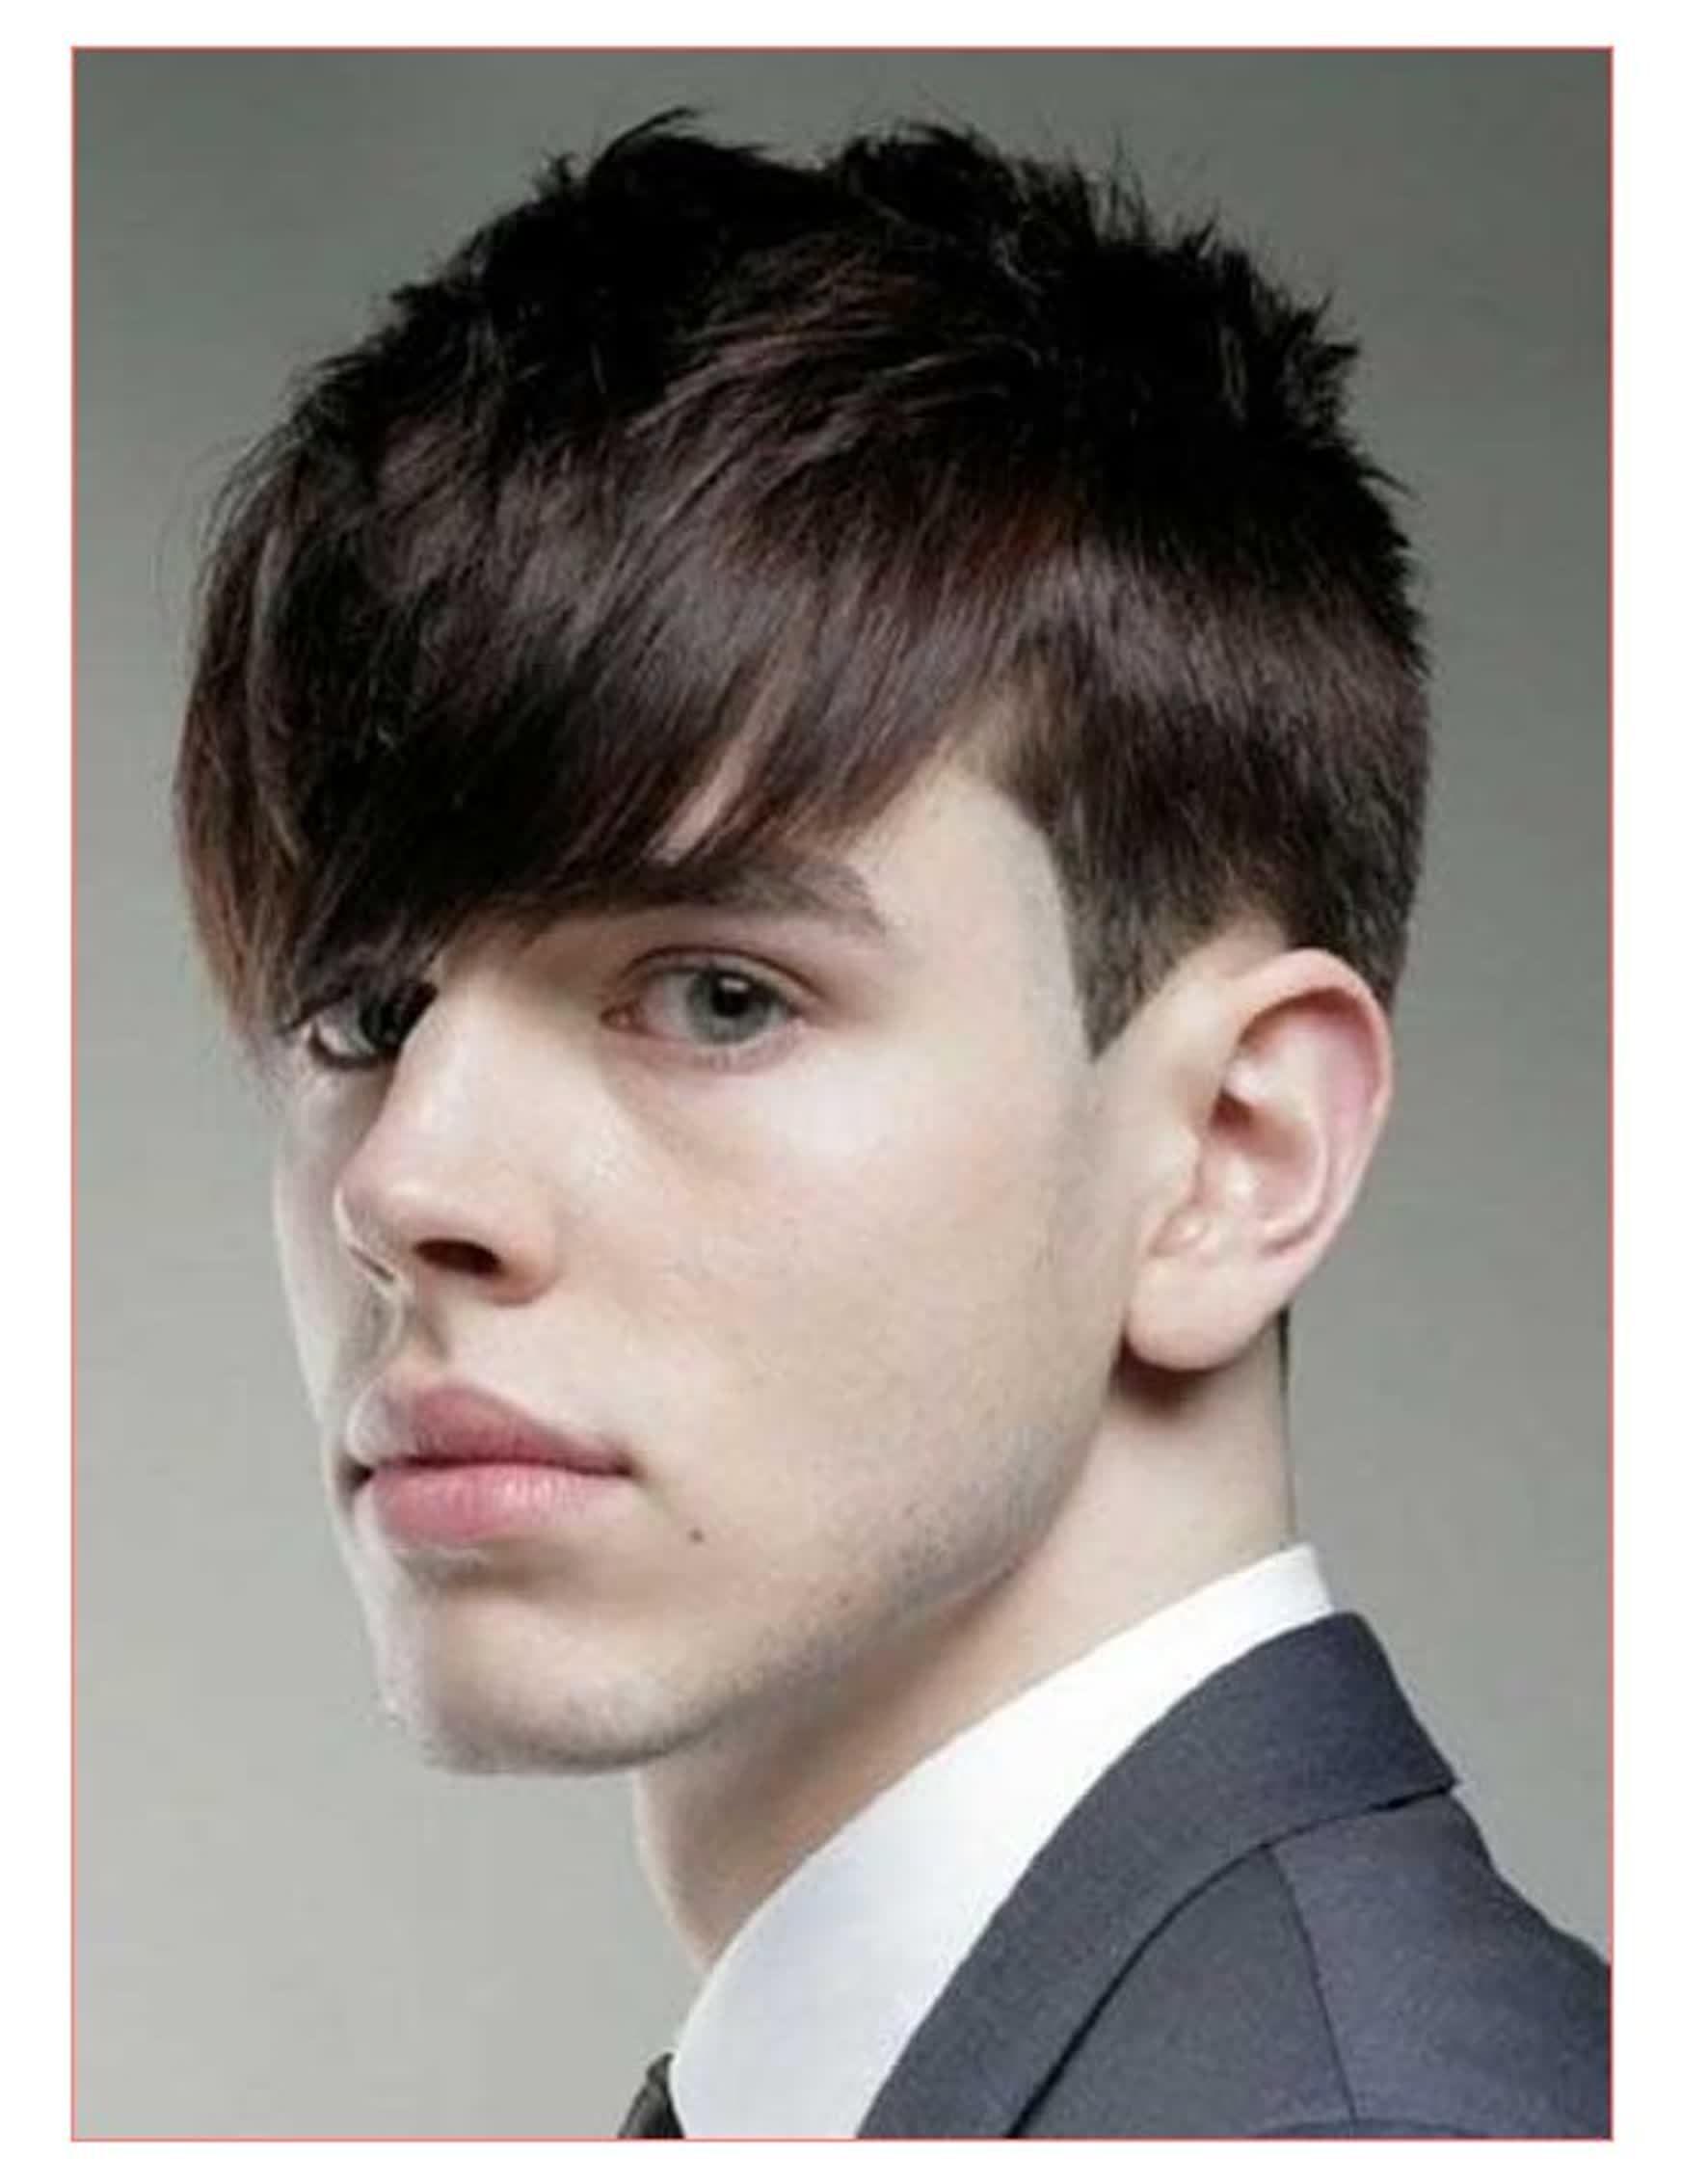 Schone Mannliche Jugendfrisuren Frisur Manner Frisur Kurz Haare Jungs Styling Kurzes Haar